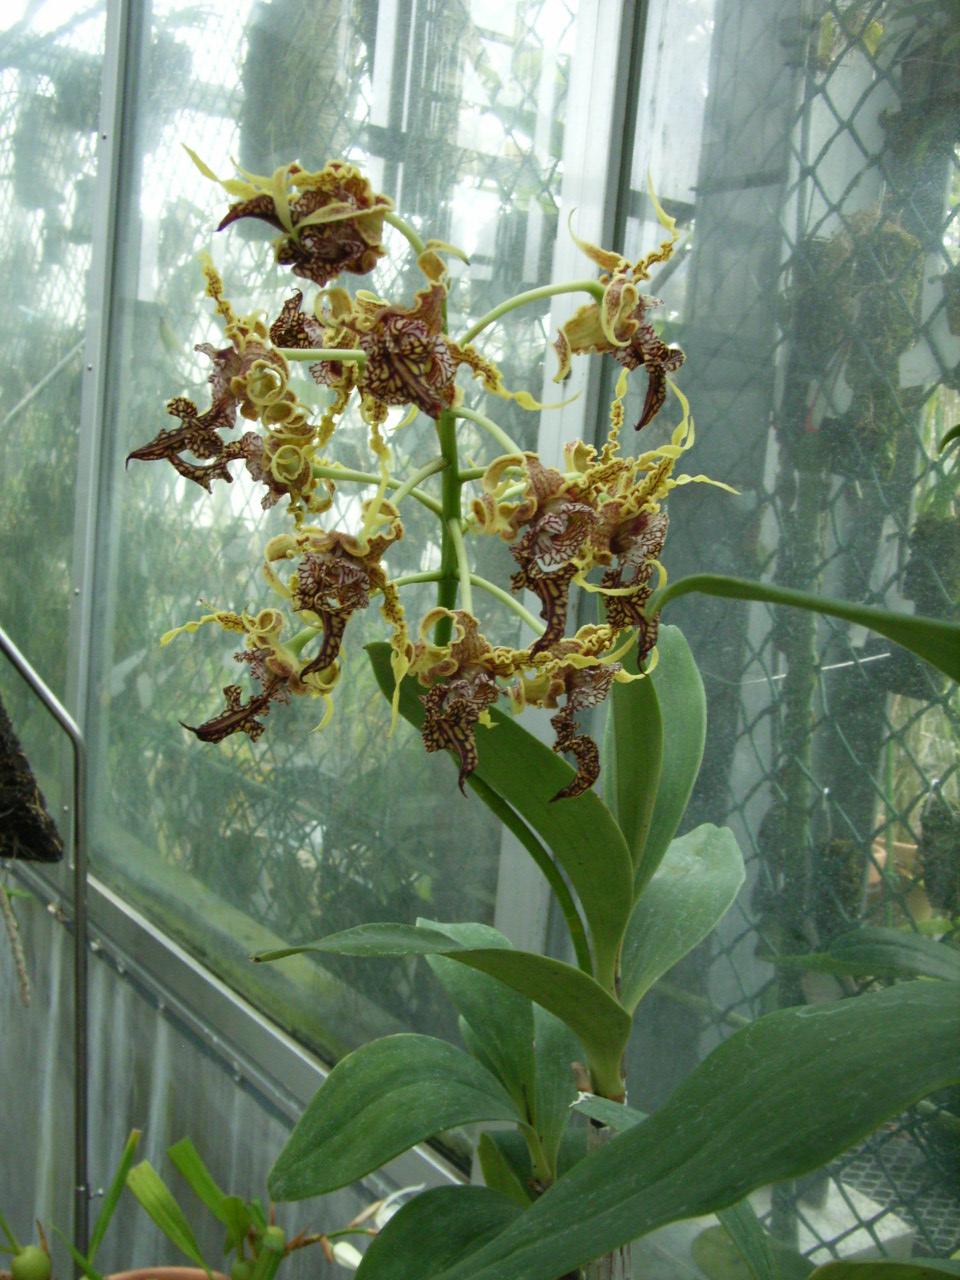 http://orchids.la.coocan.jp/Dendrobium/Dendrobium%20spectabile/R0054143.JPG